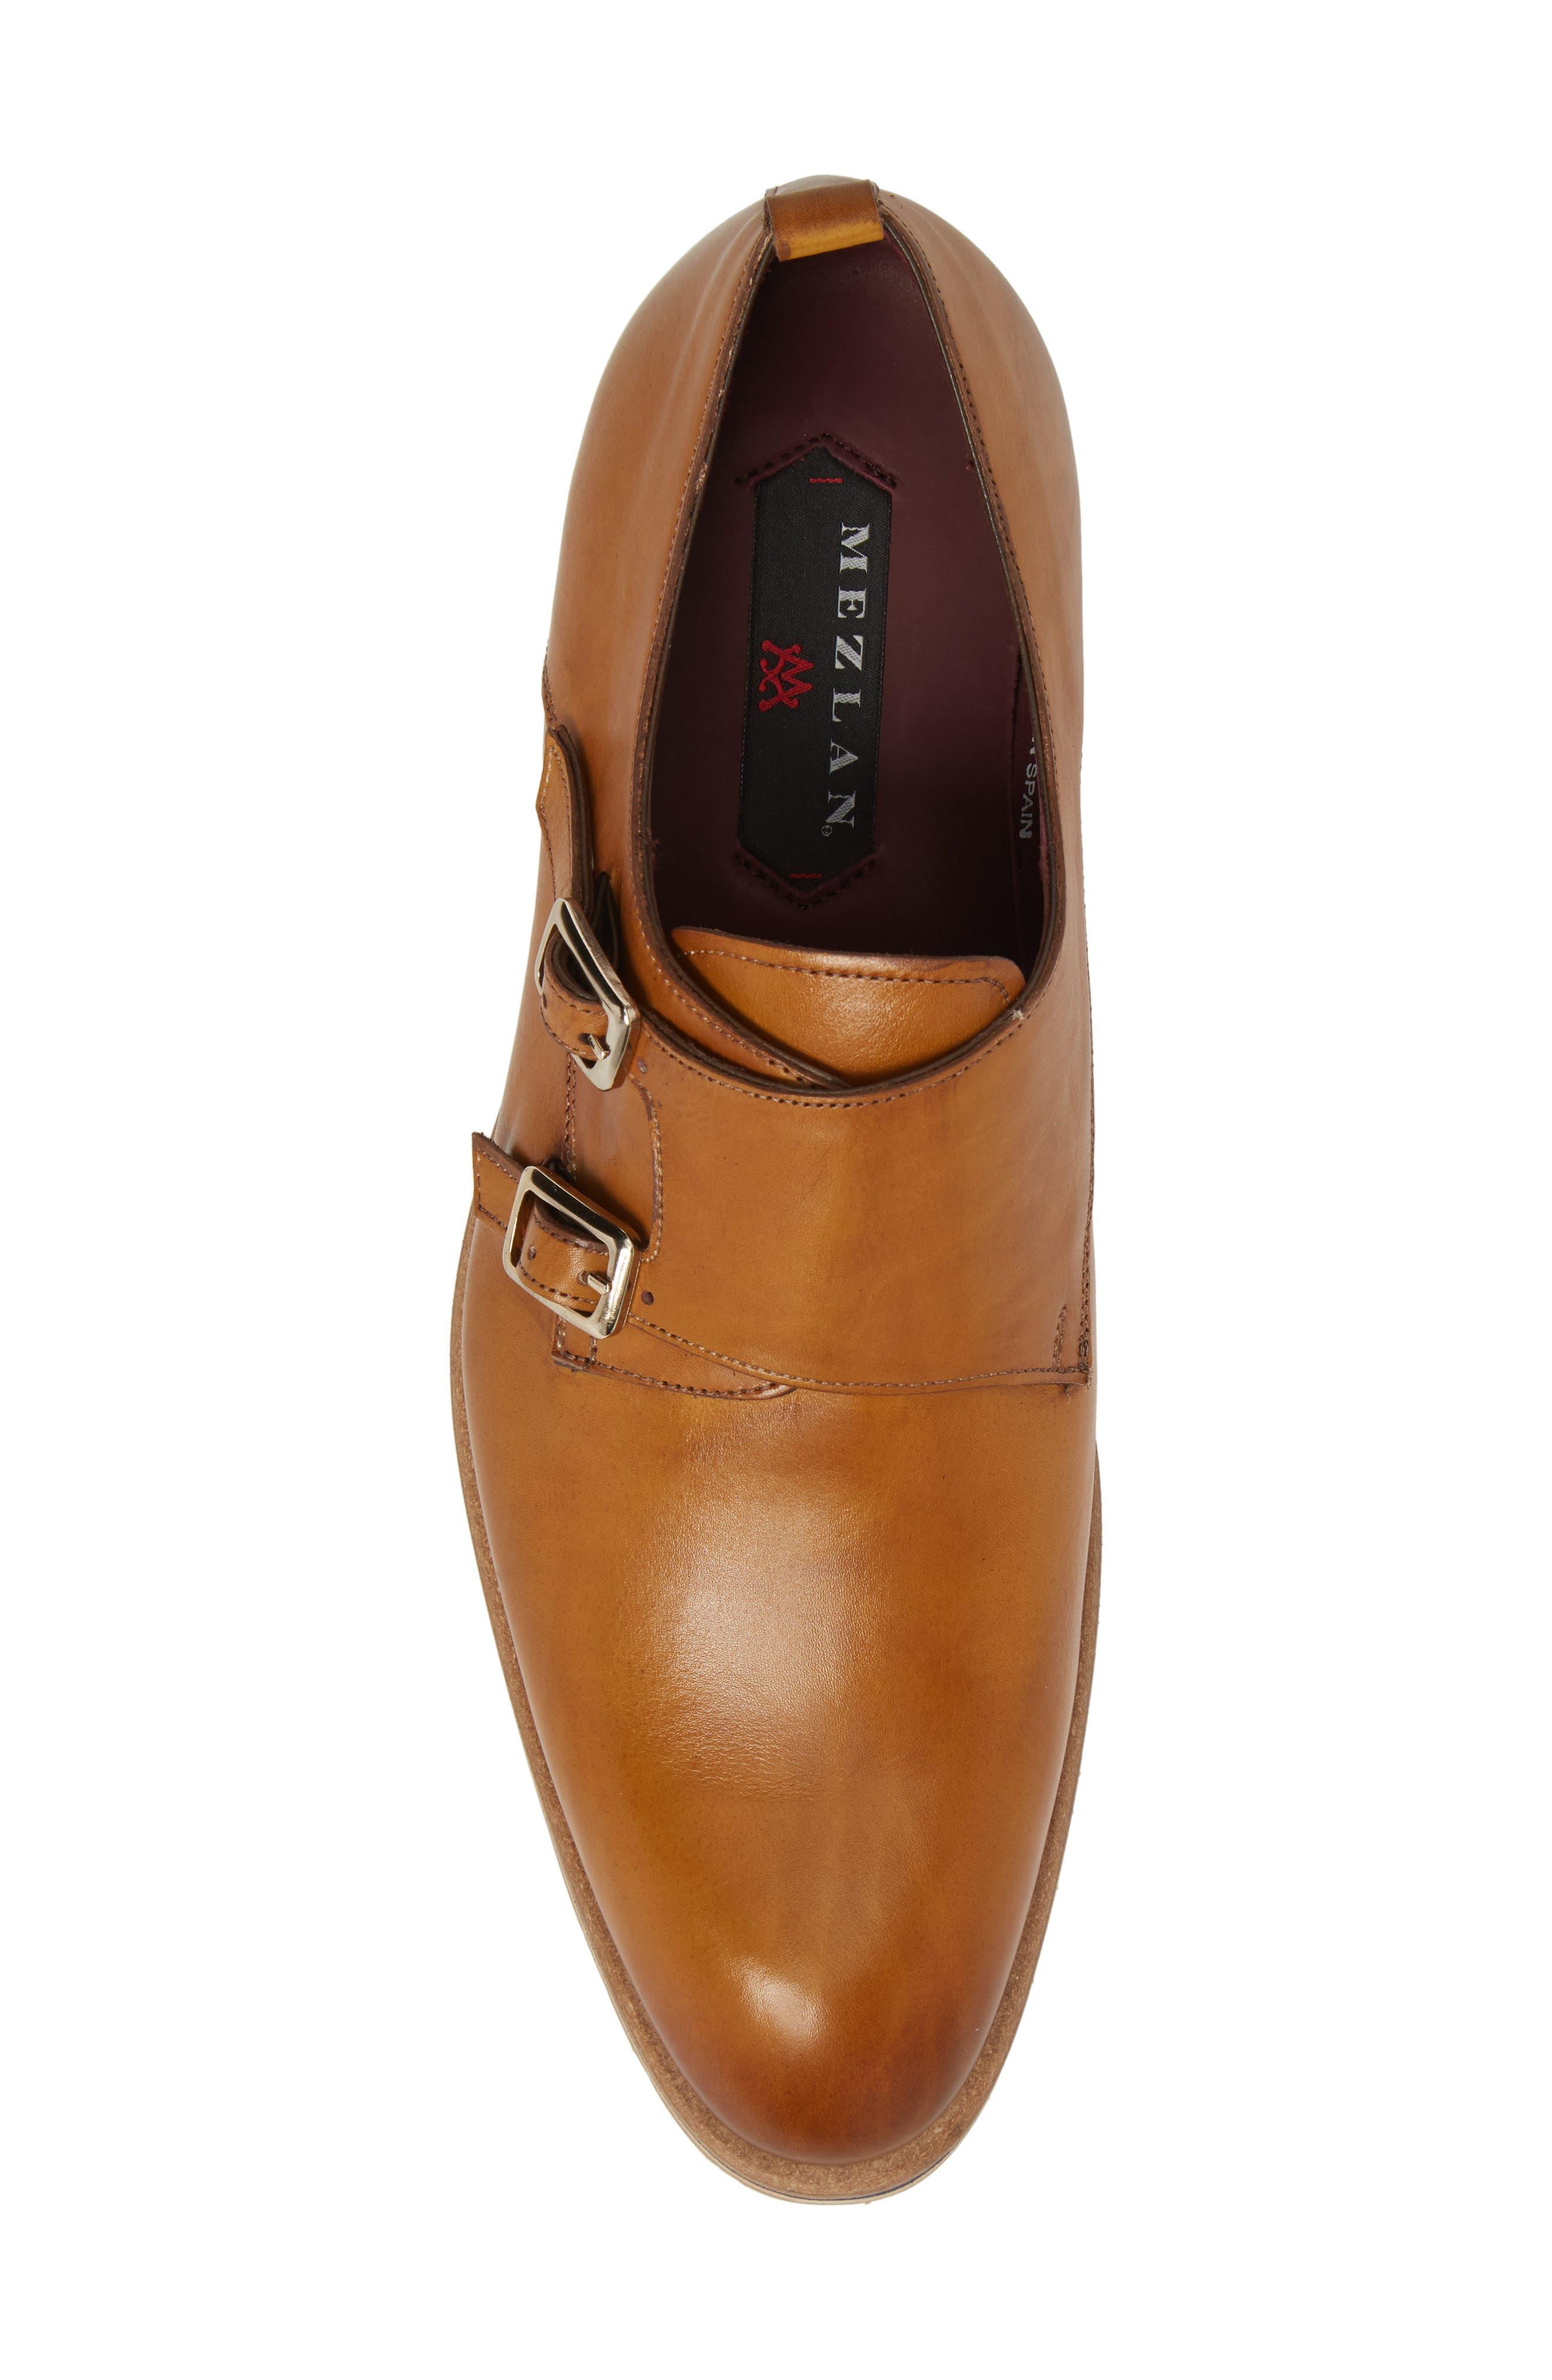 Apolo Double Buckle Monk Shoe,                             Alternate thumbnail 5, color,                             Honey Leather